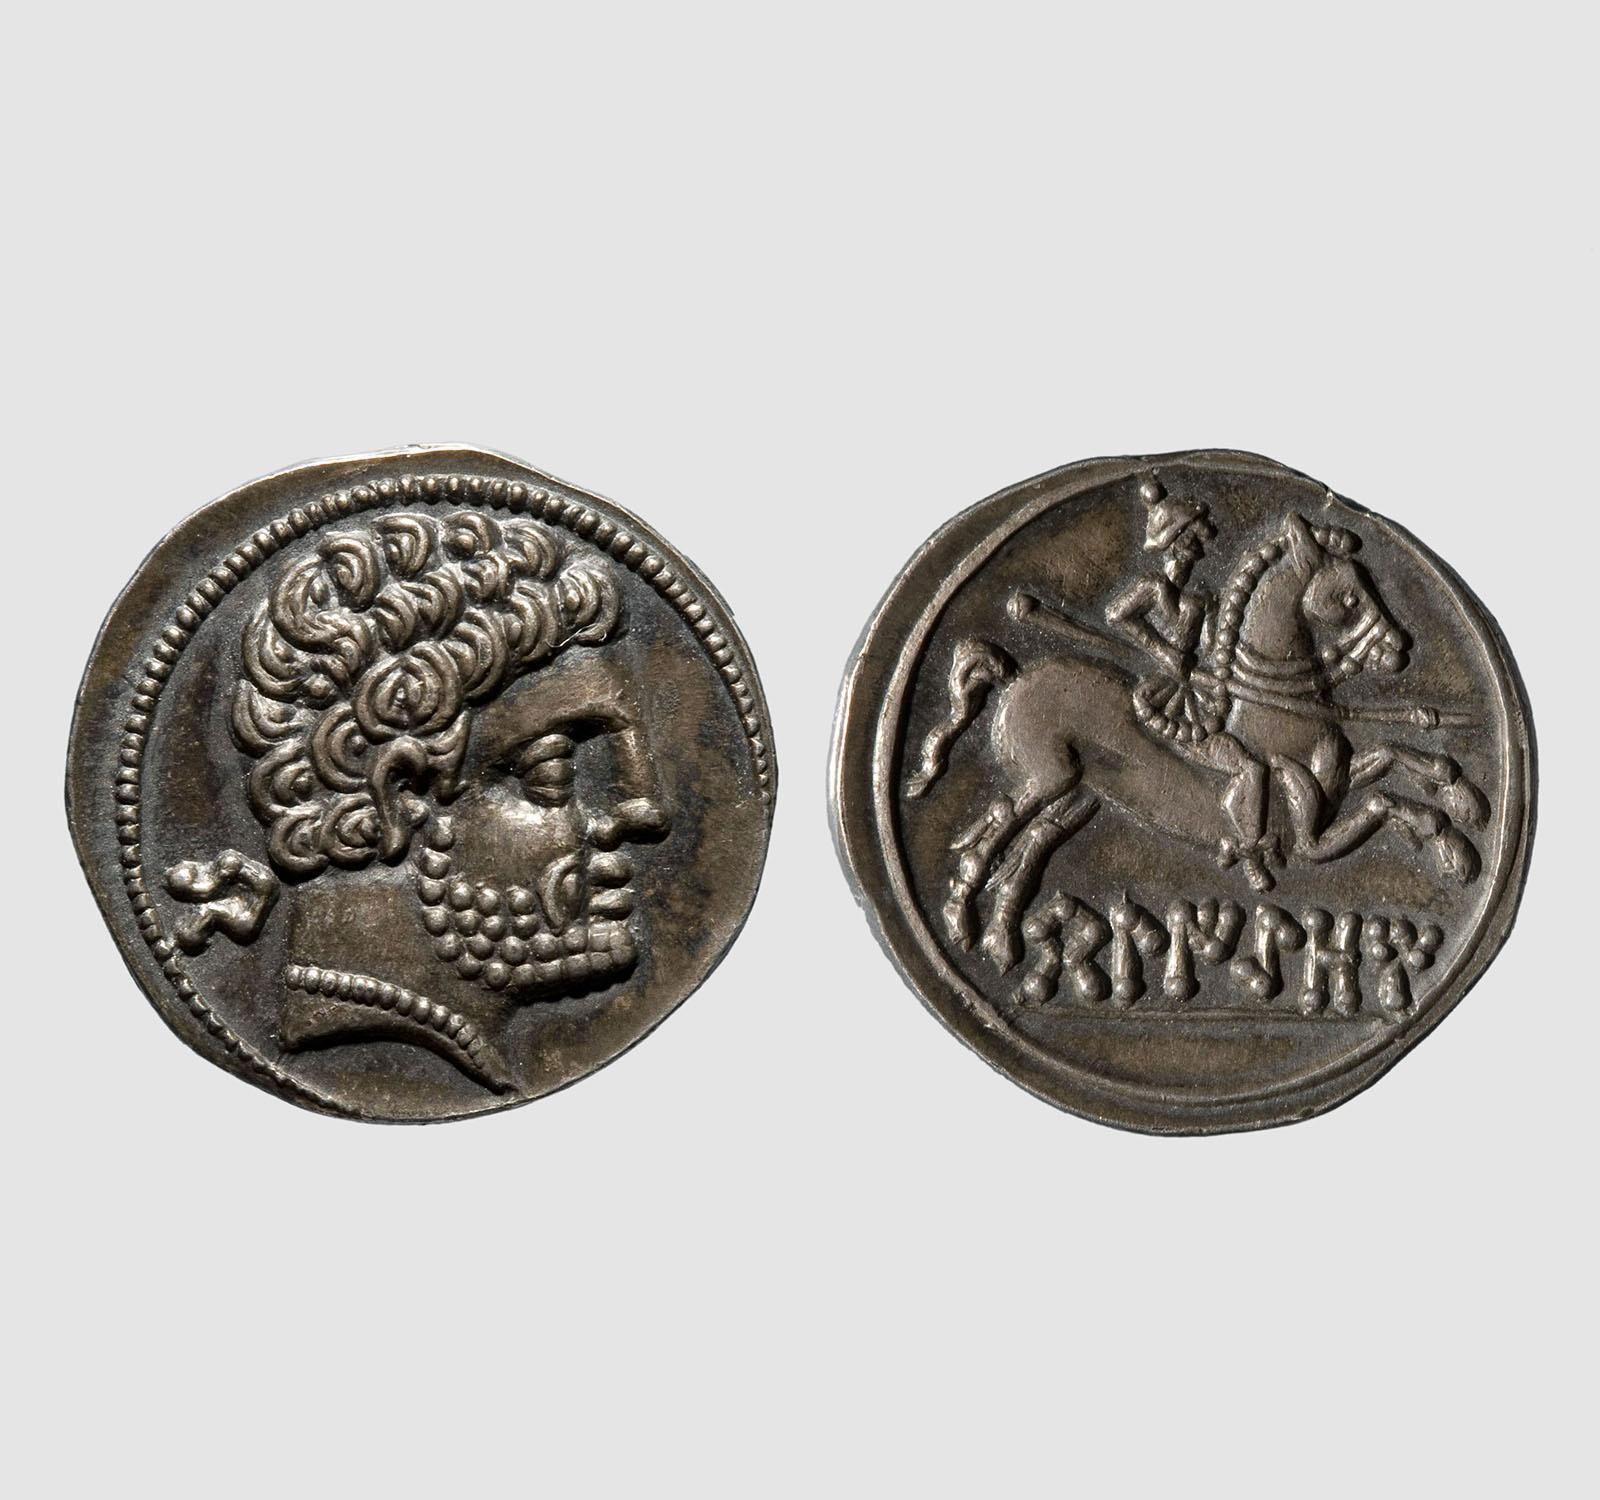 Denari de Belikiom, segona meitat del segle II aC – inicis del segle I aC